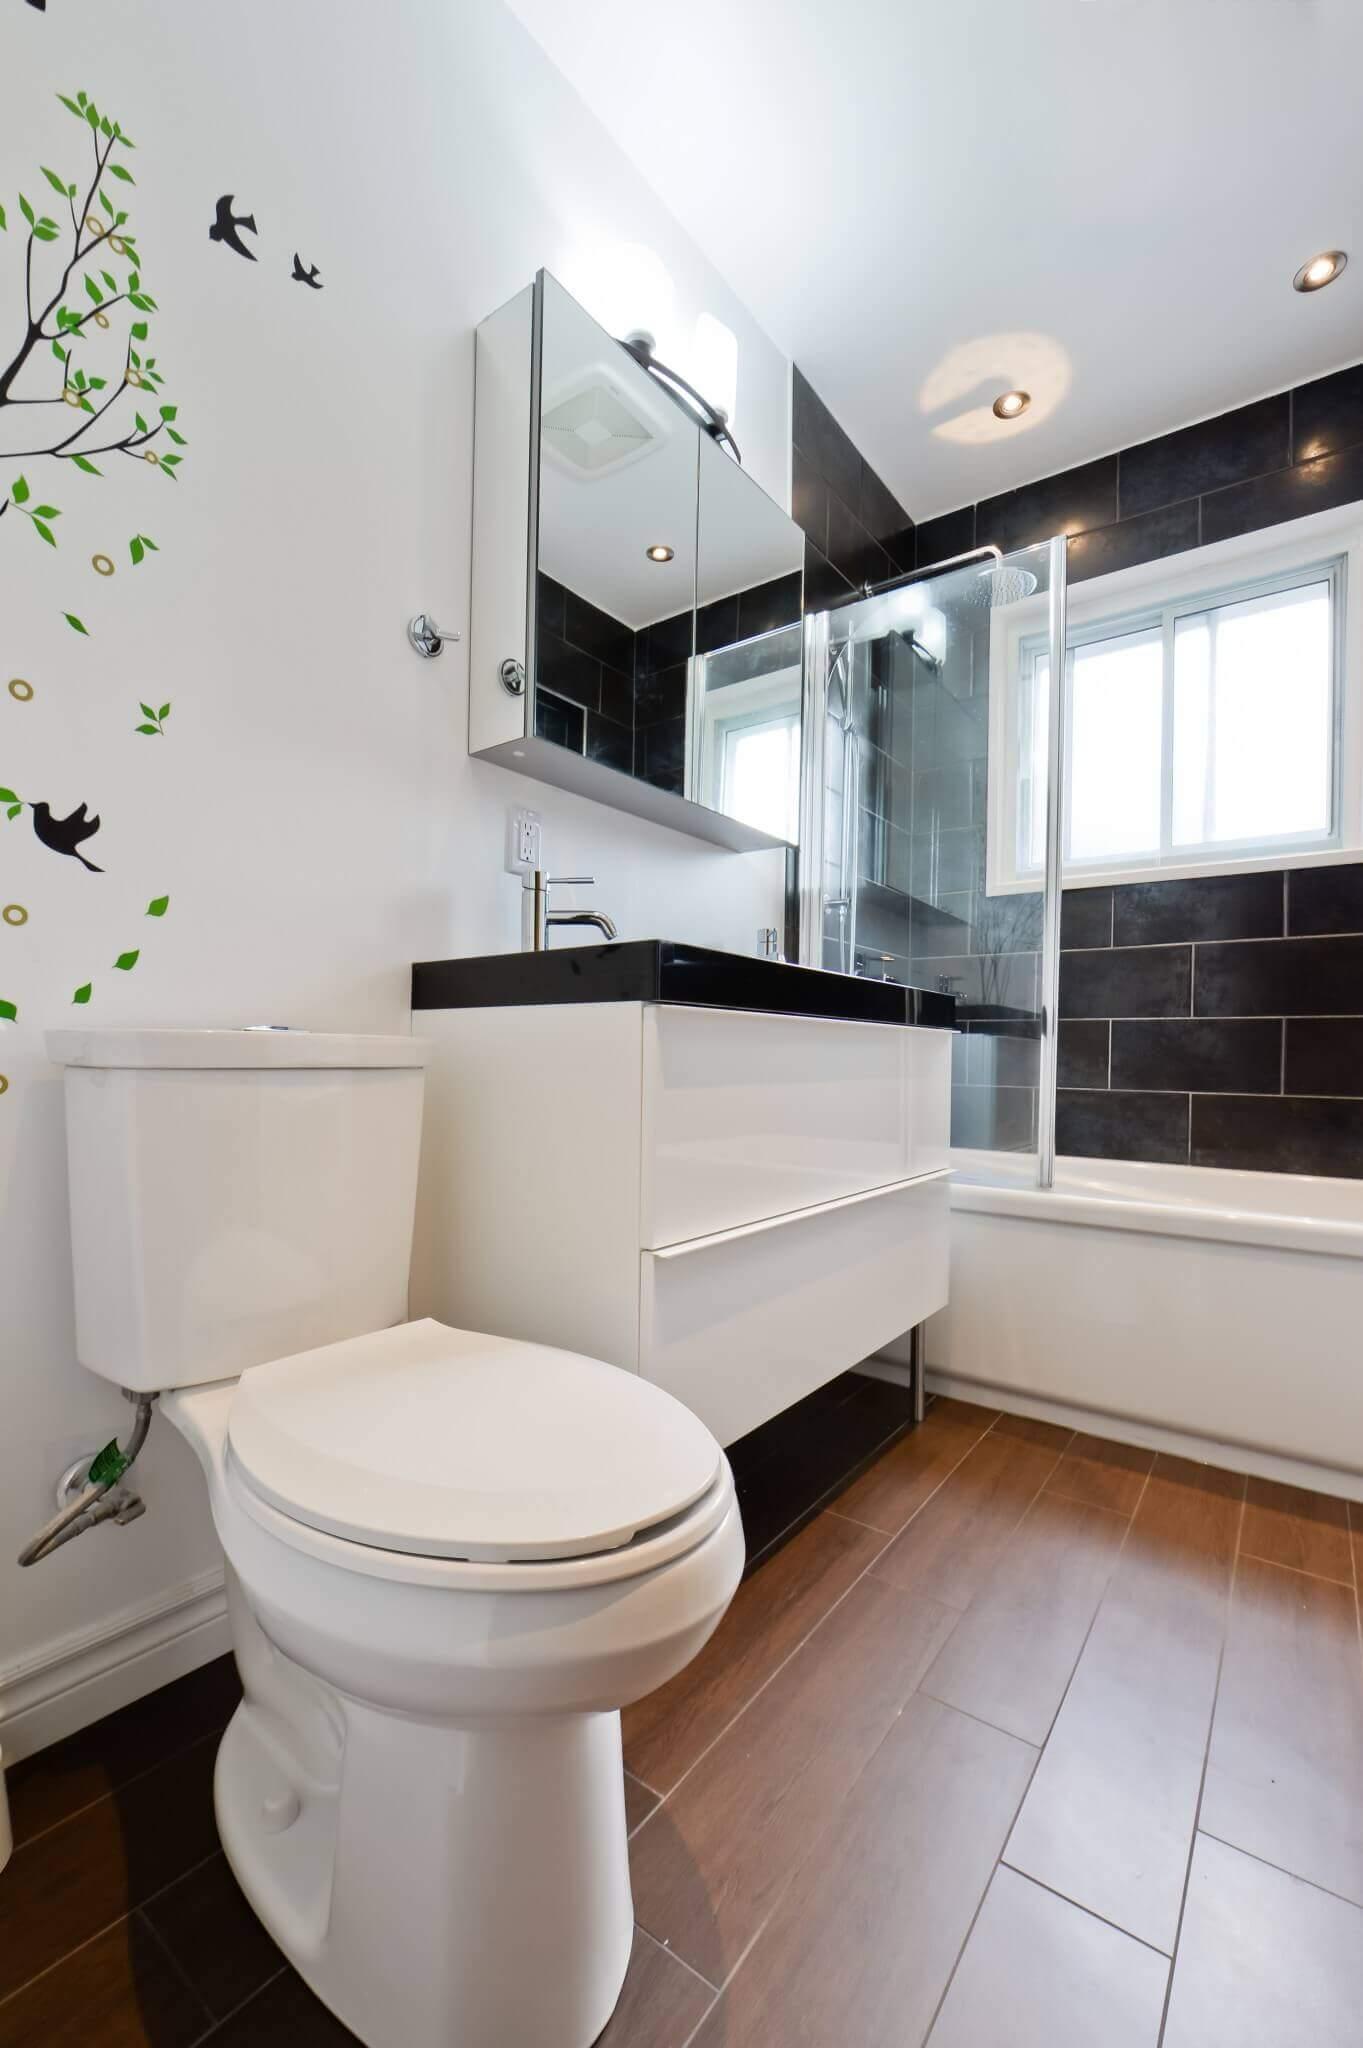 toilette et vanite salle de bain